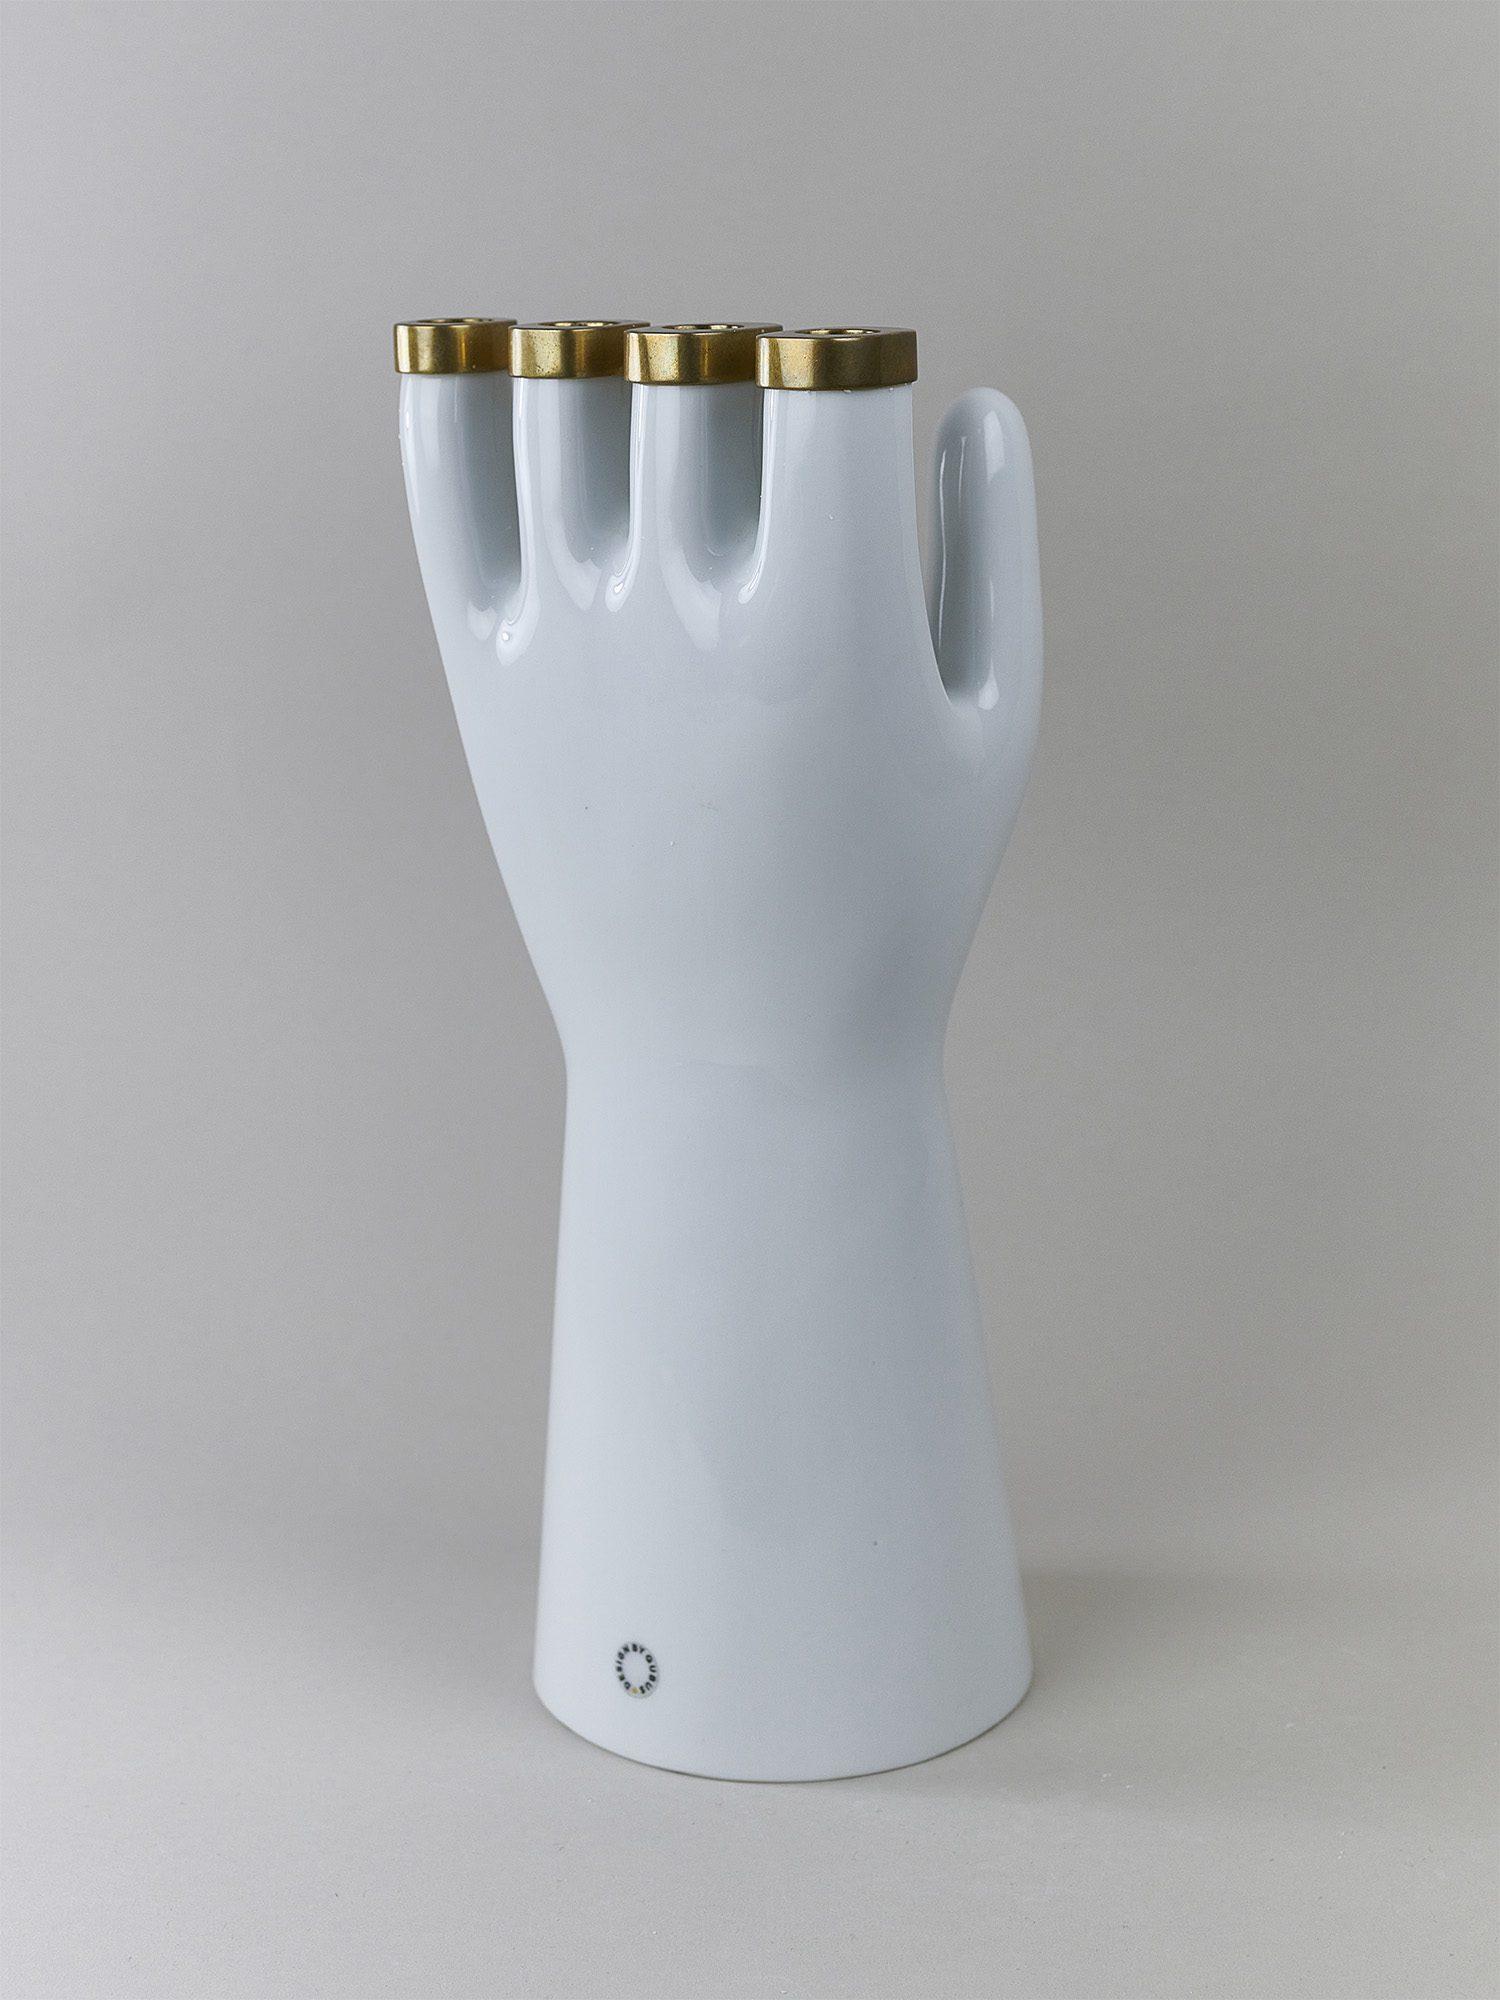 A porcelain candleholder tray by Qubus design studio